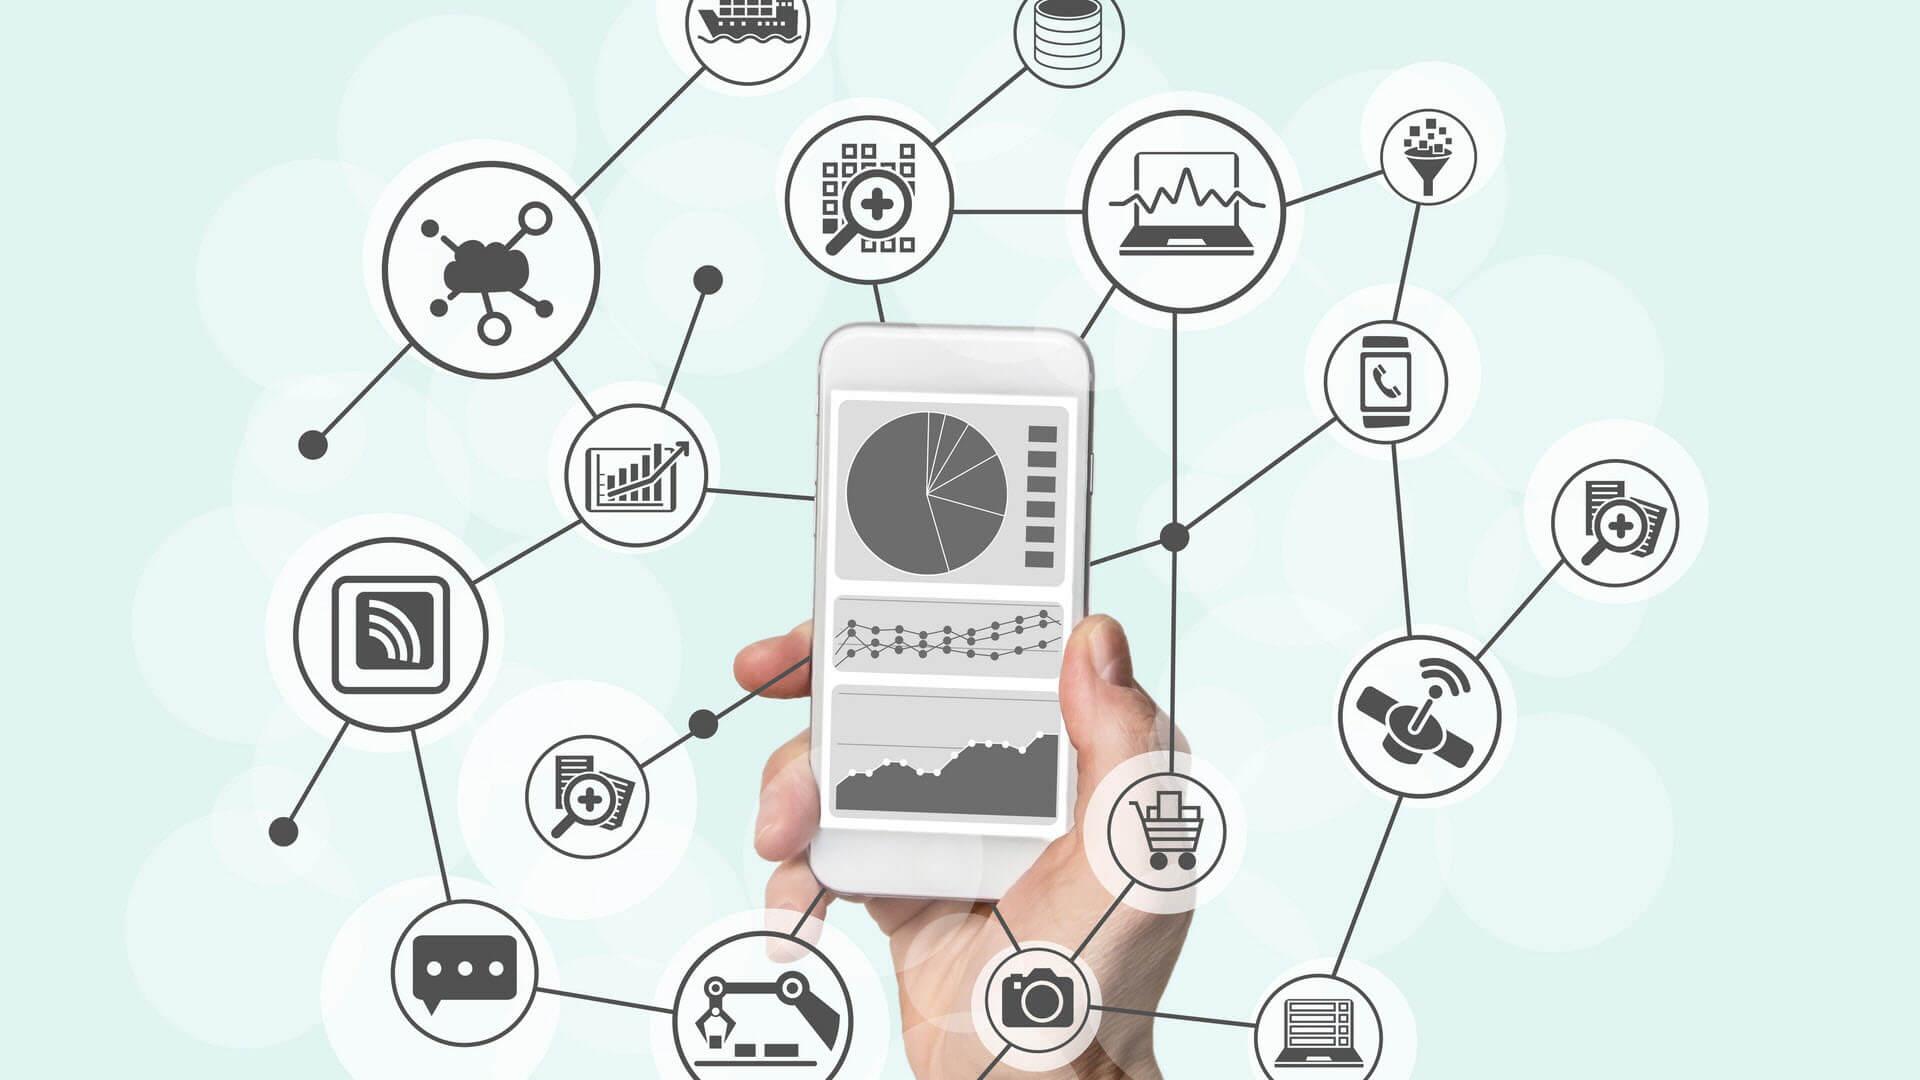 smartphone_analytics-366588536-ss-1920